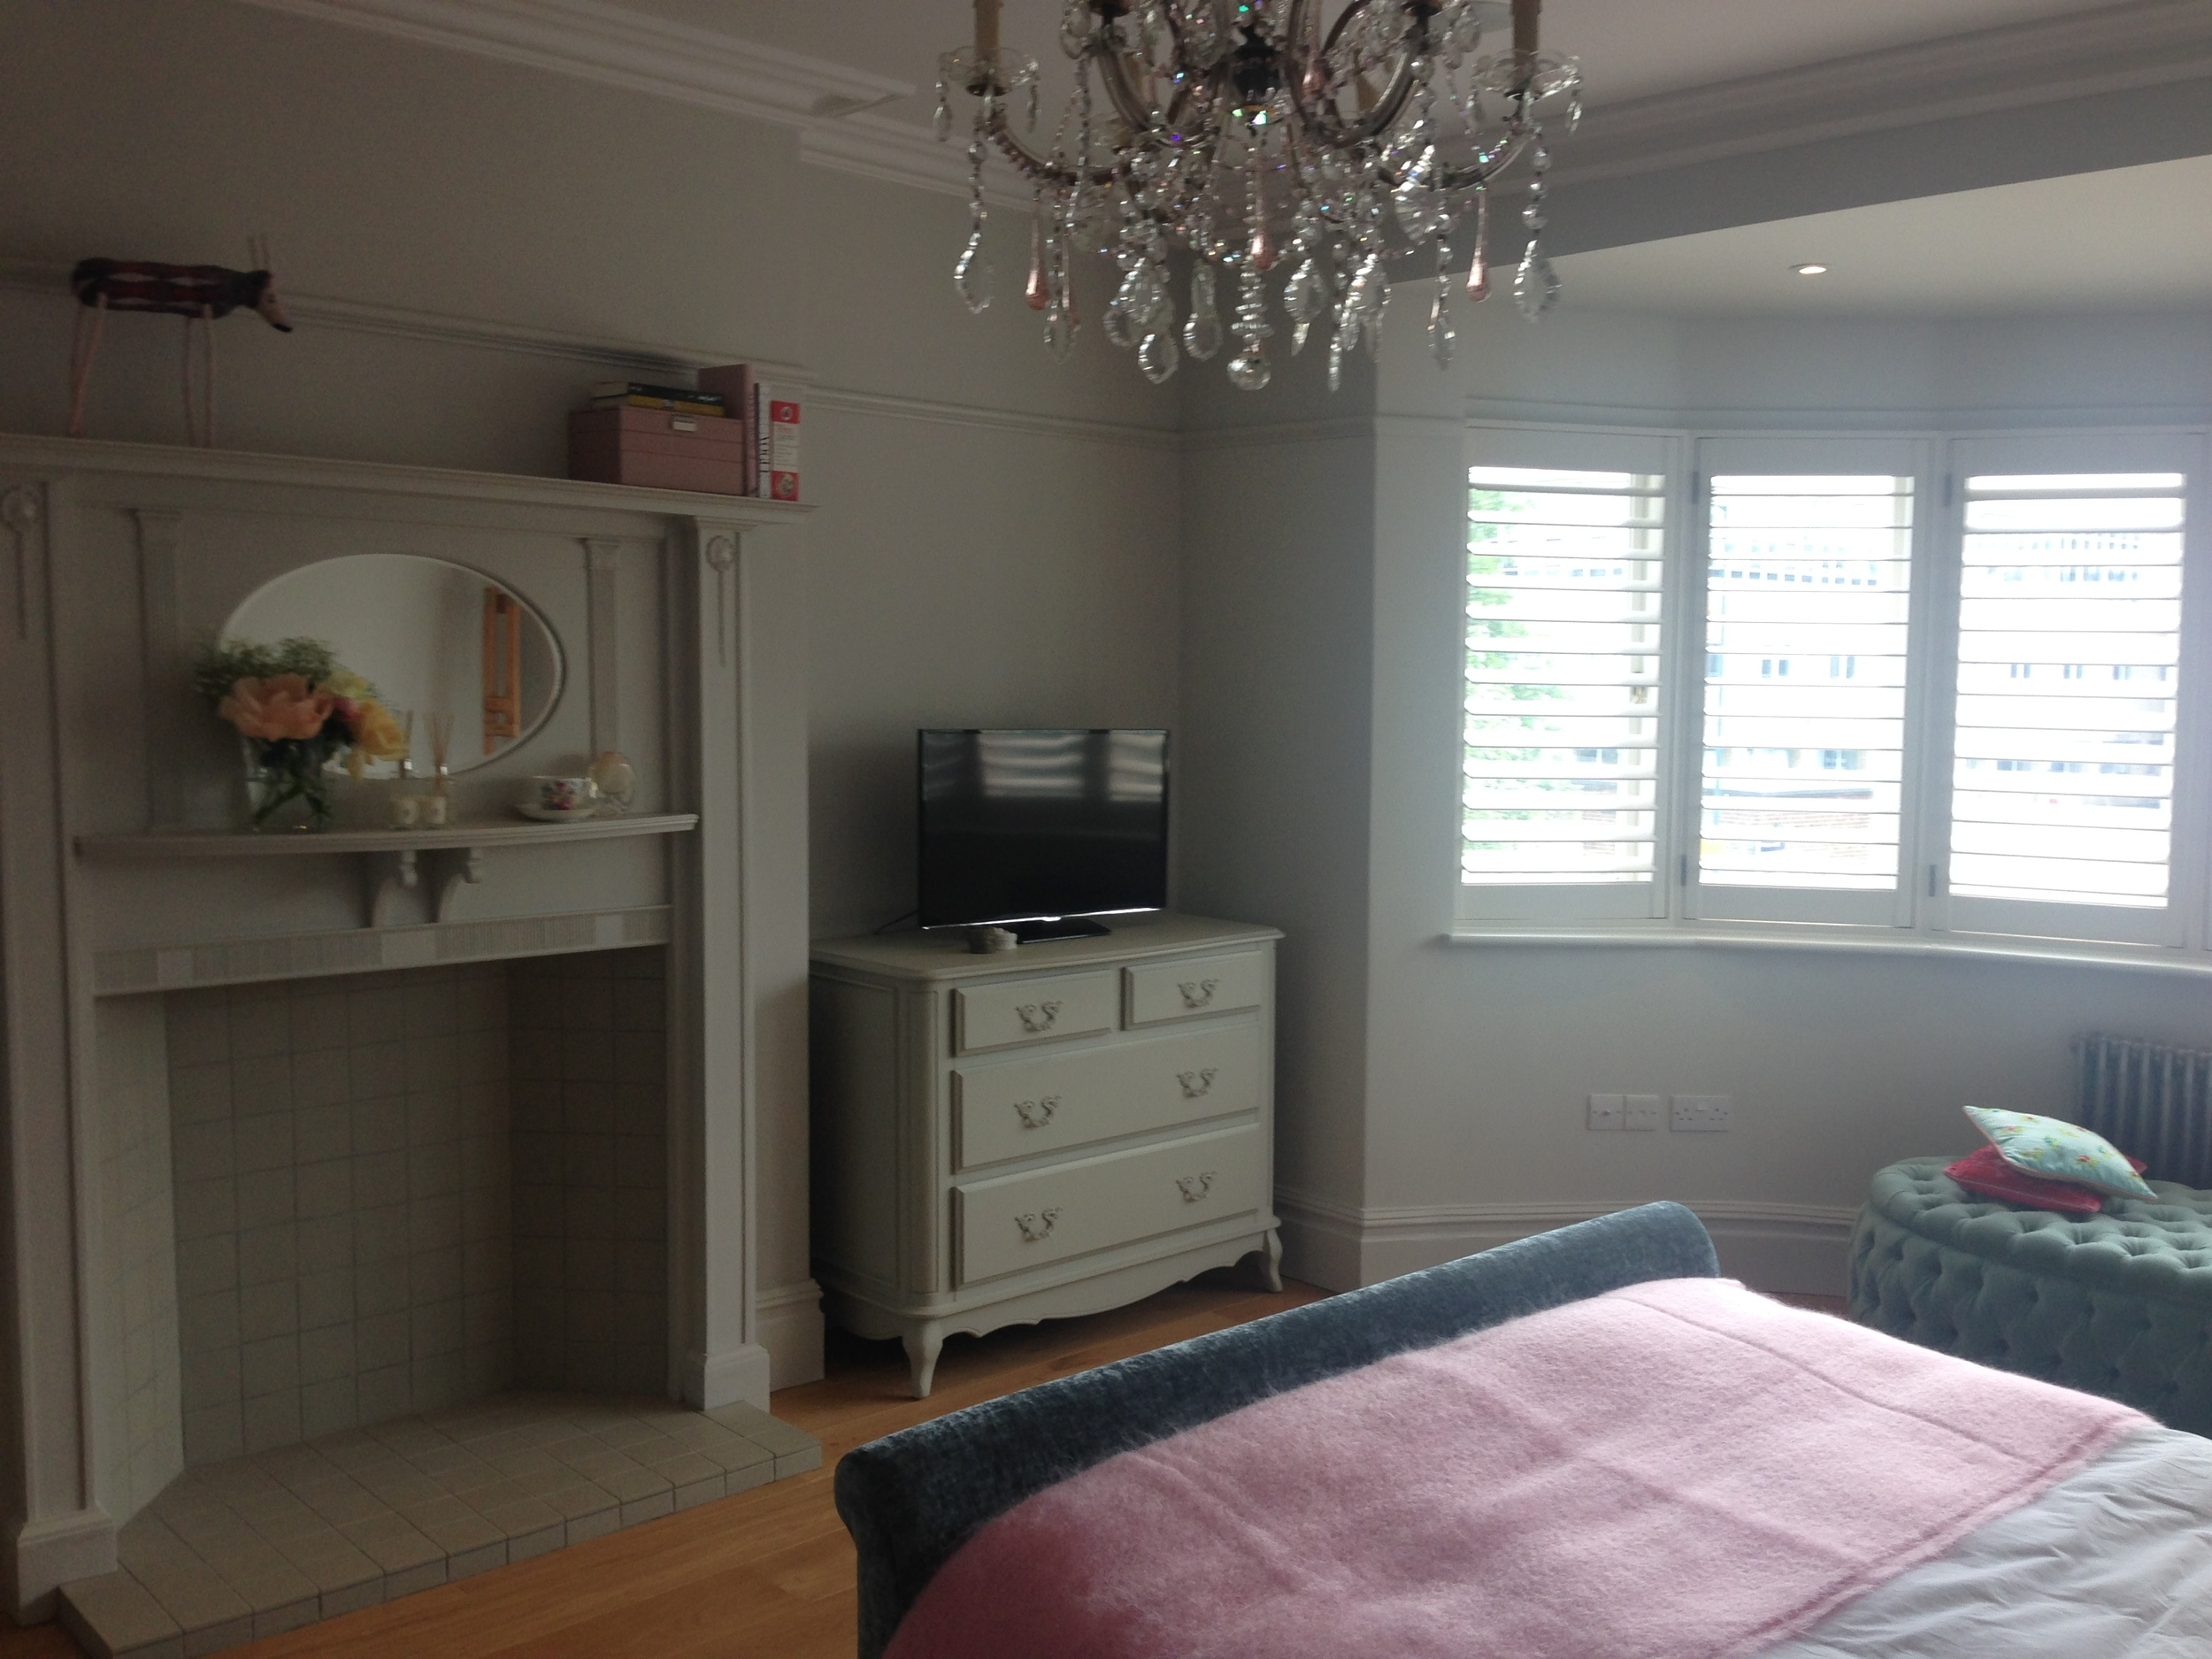 House 5 - Daughter's Bedroom